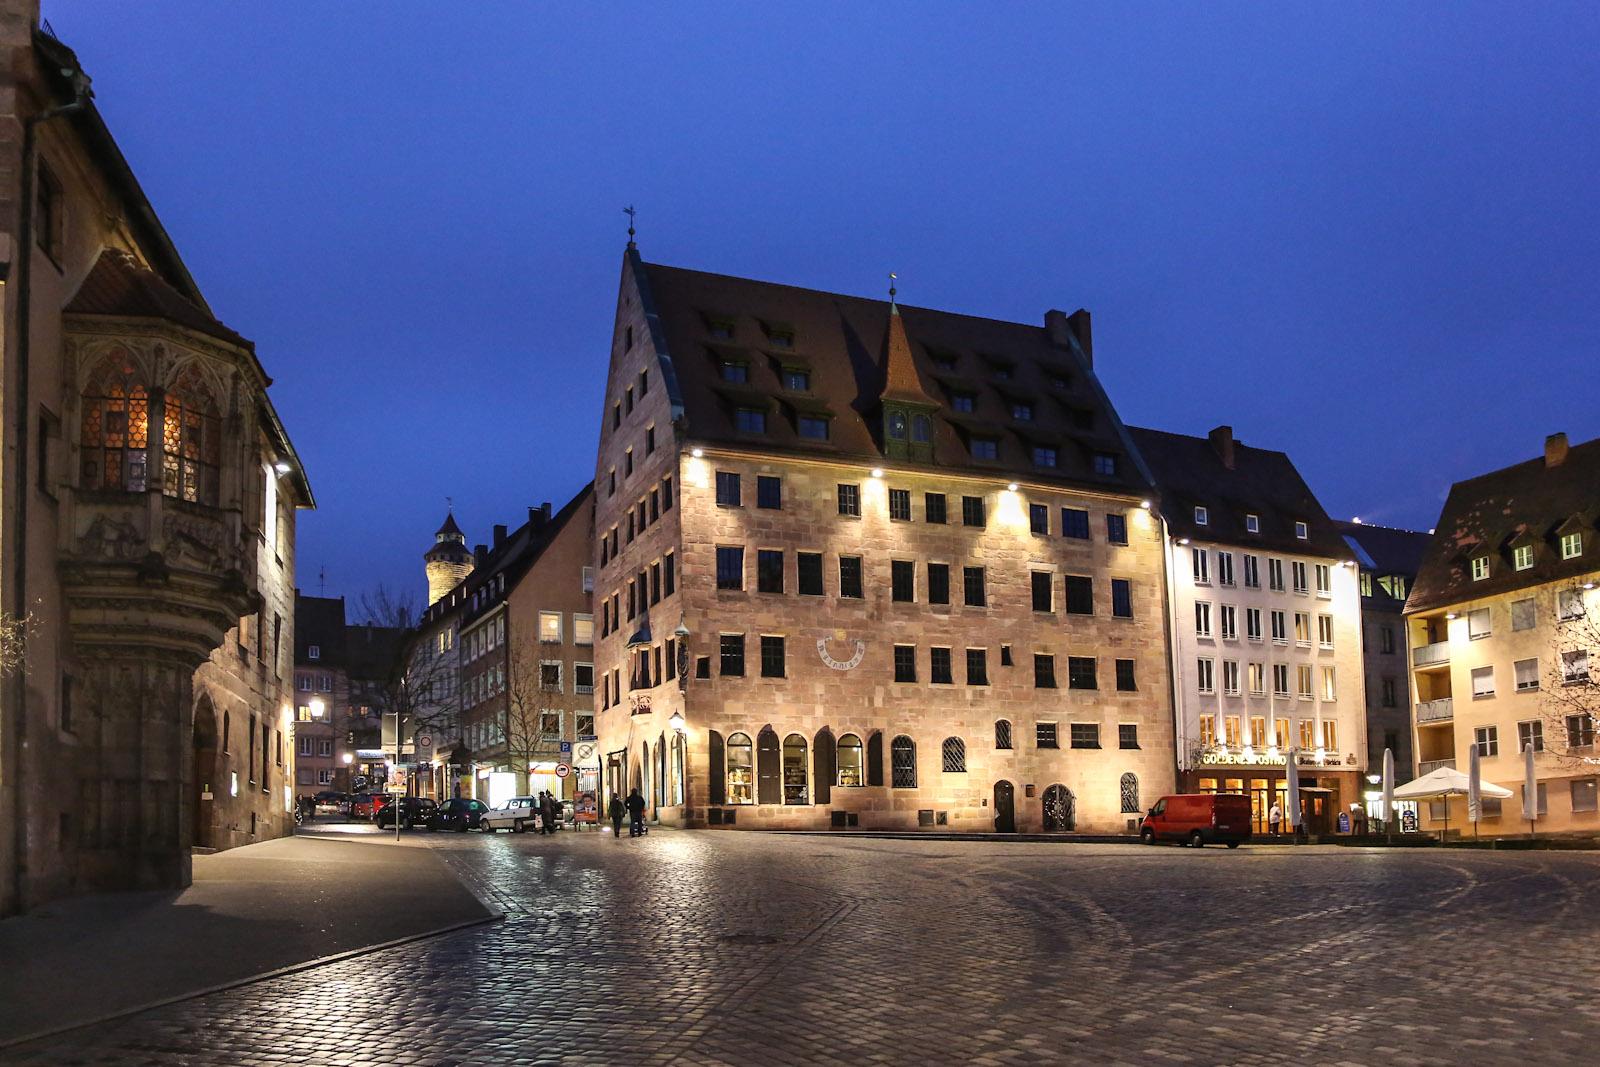 В центре города Нюрнберг